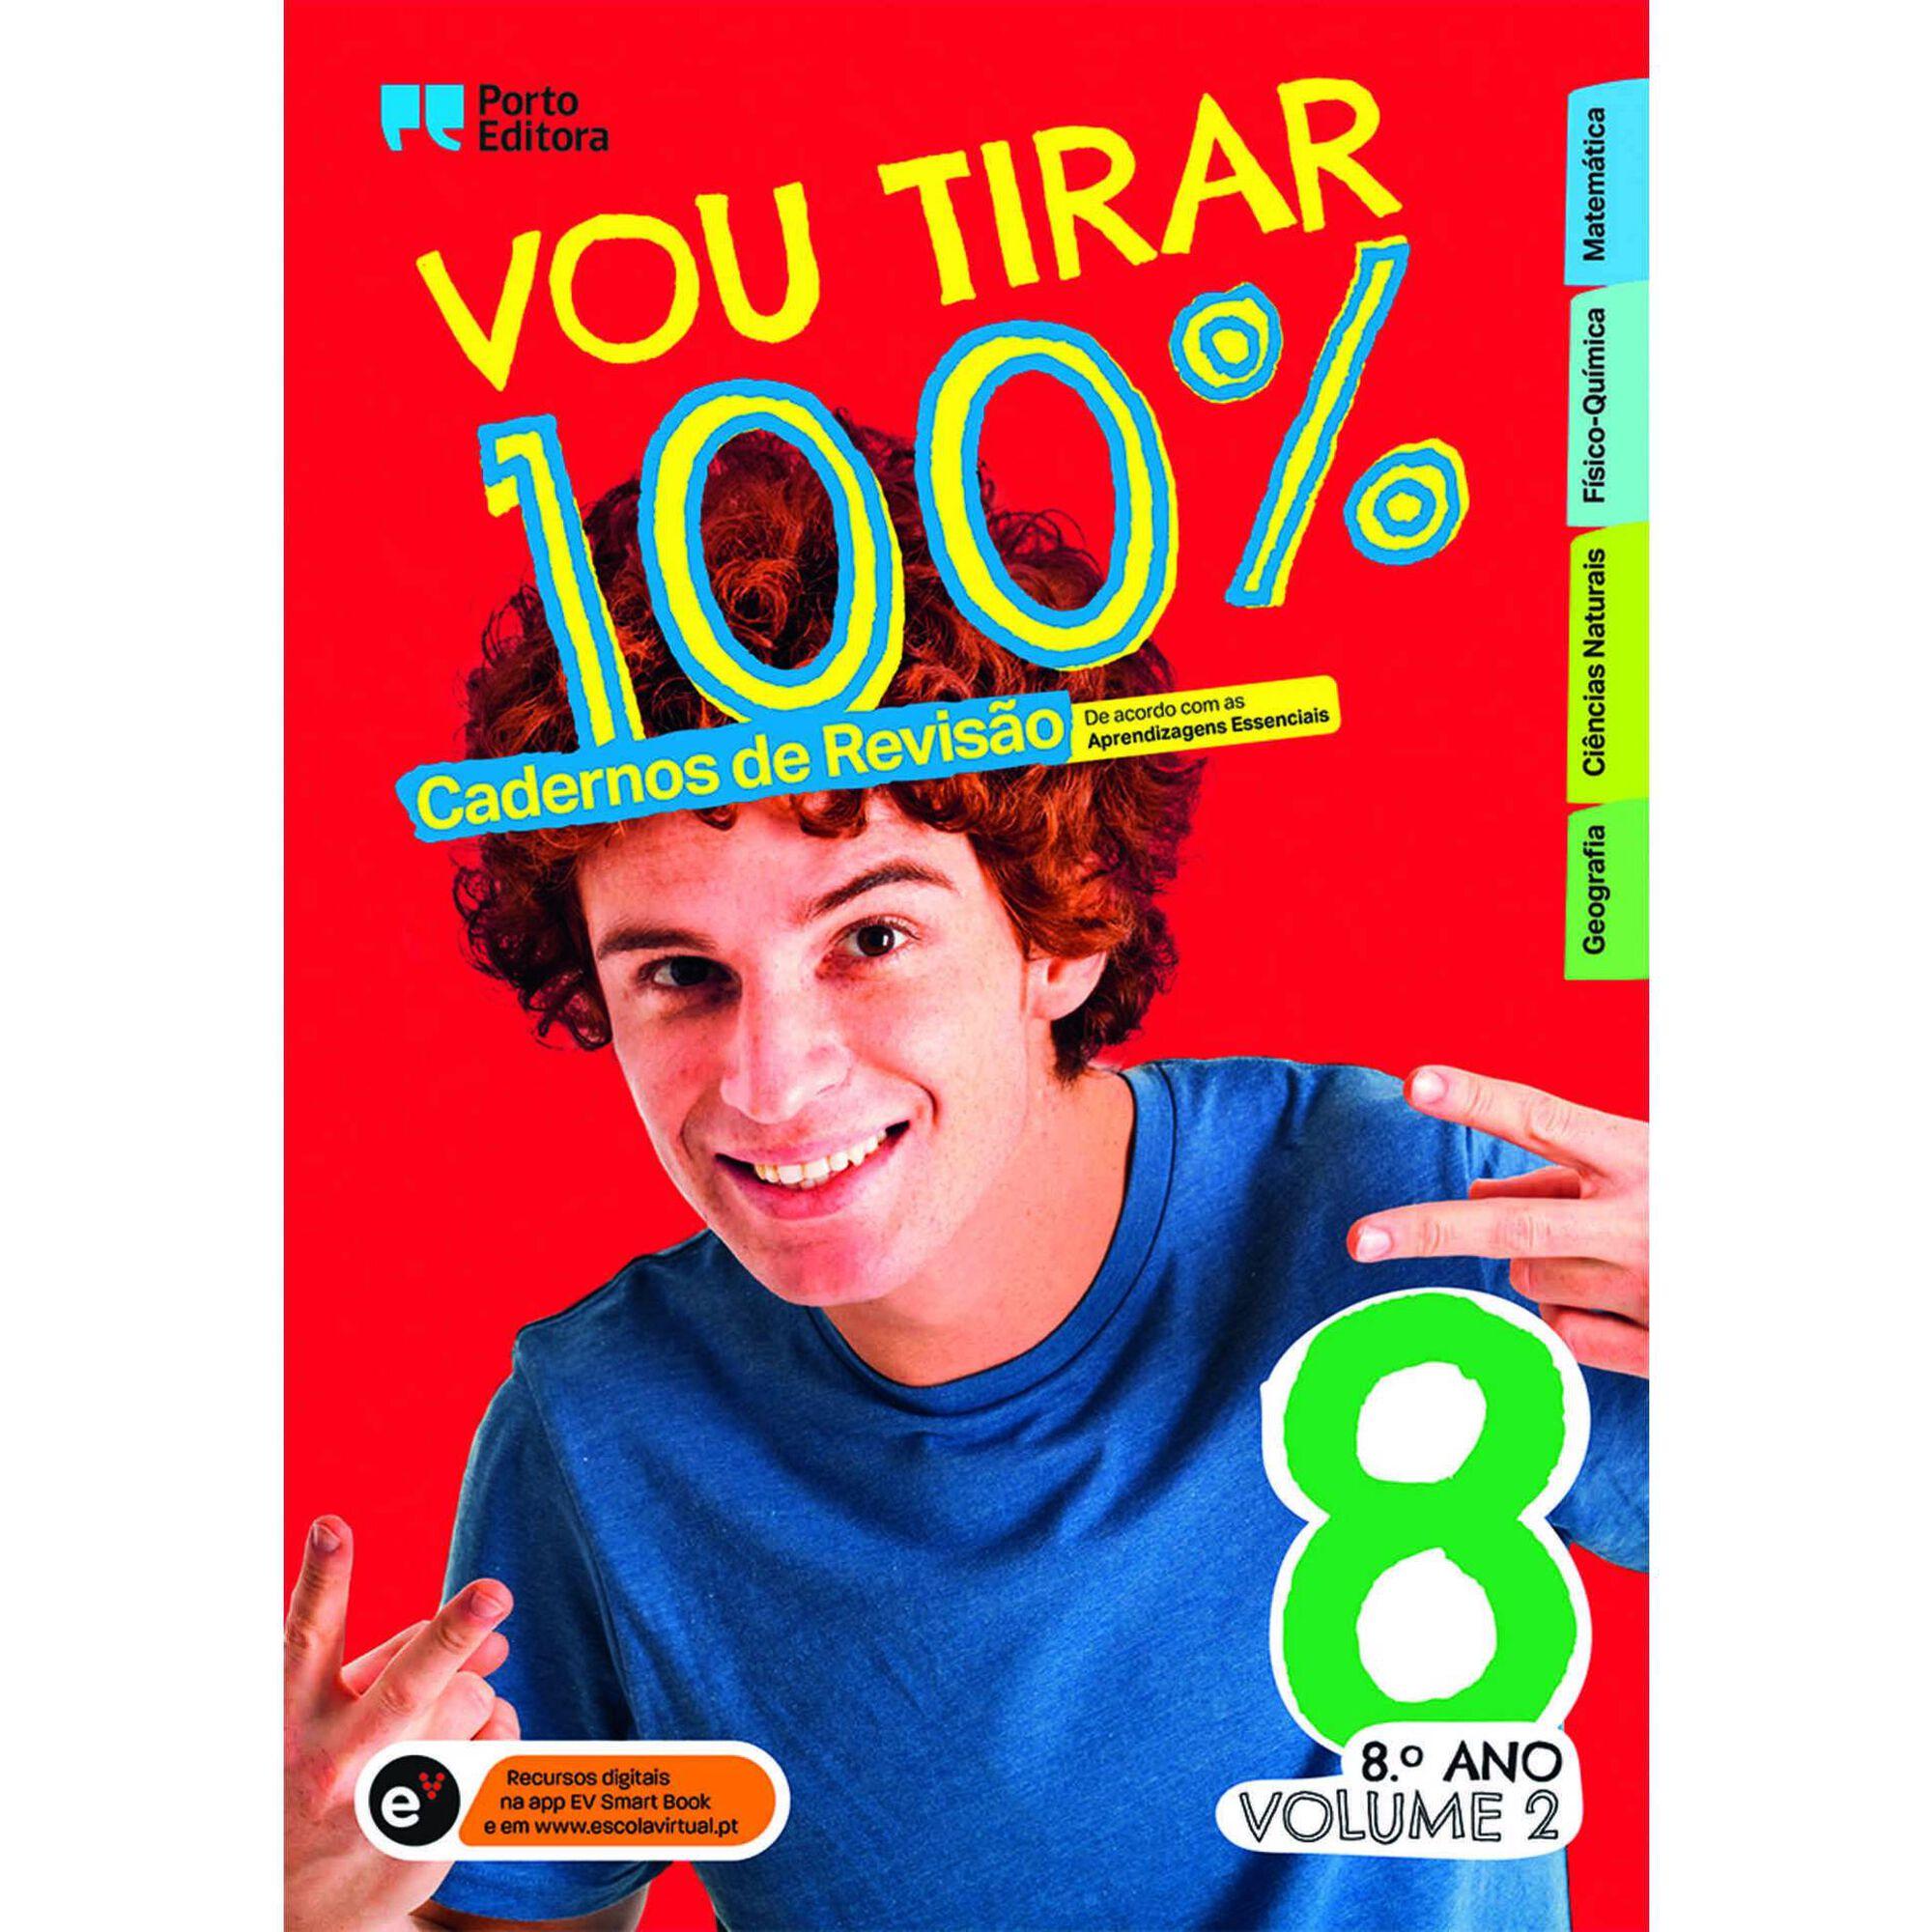 Vou Tirar 100% - 8º Ano (volume 2)